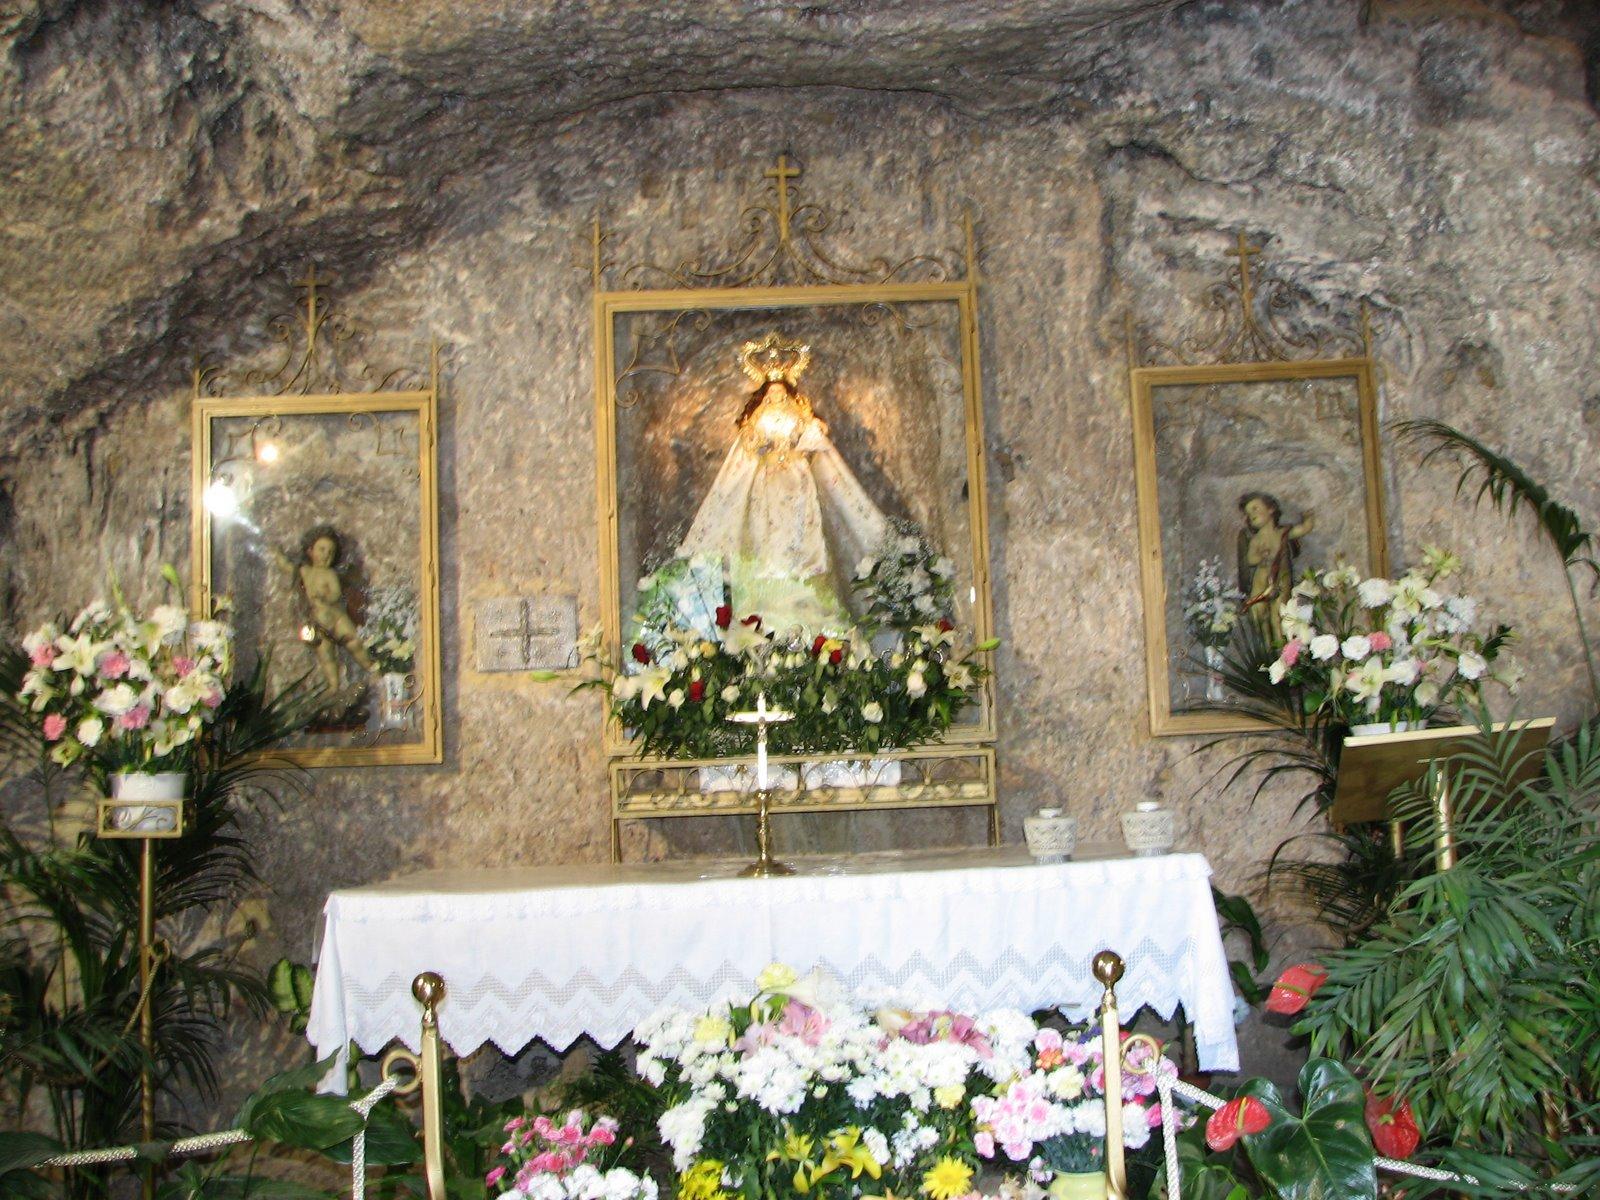 Santuario de la Virgen de la Pena